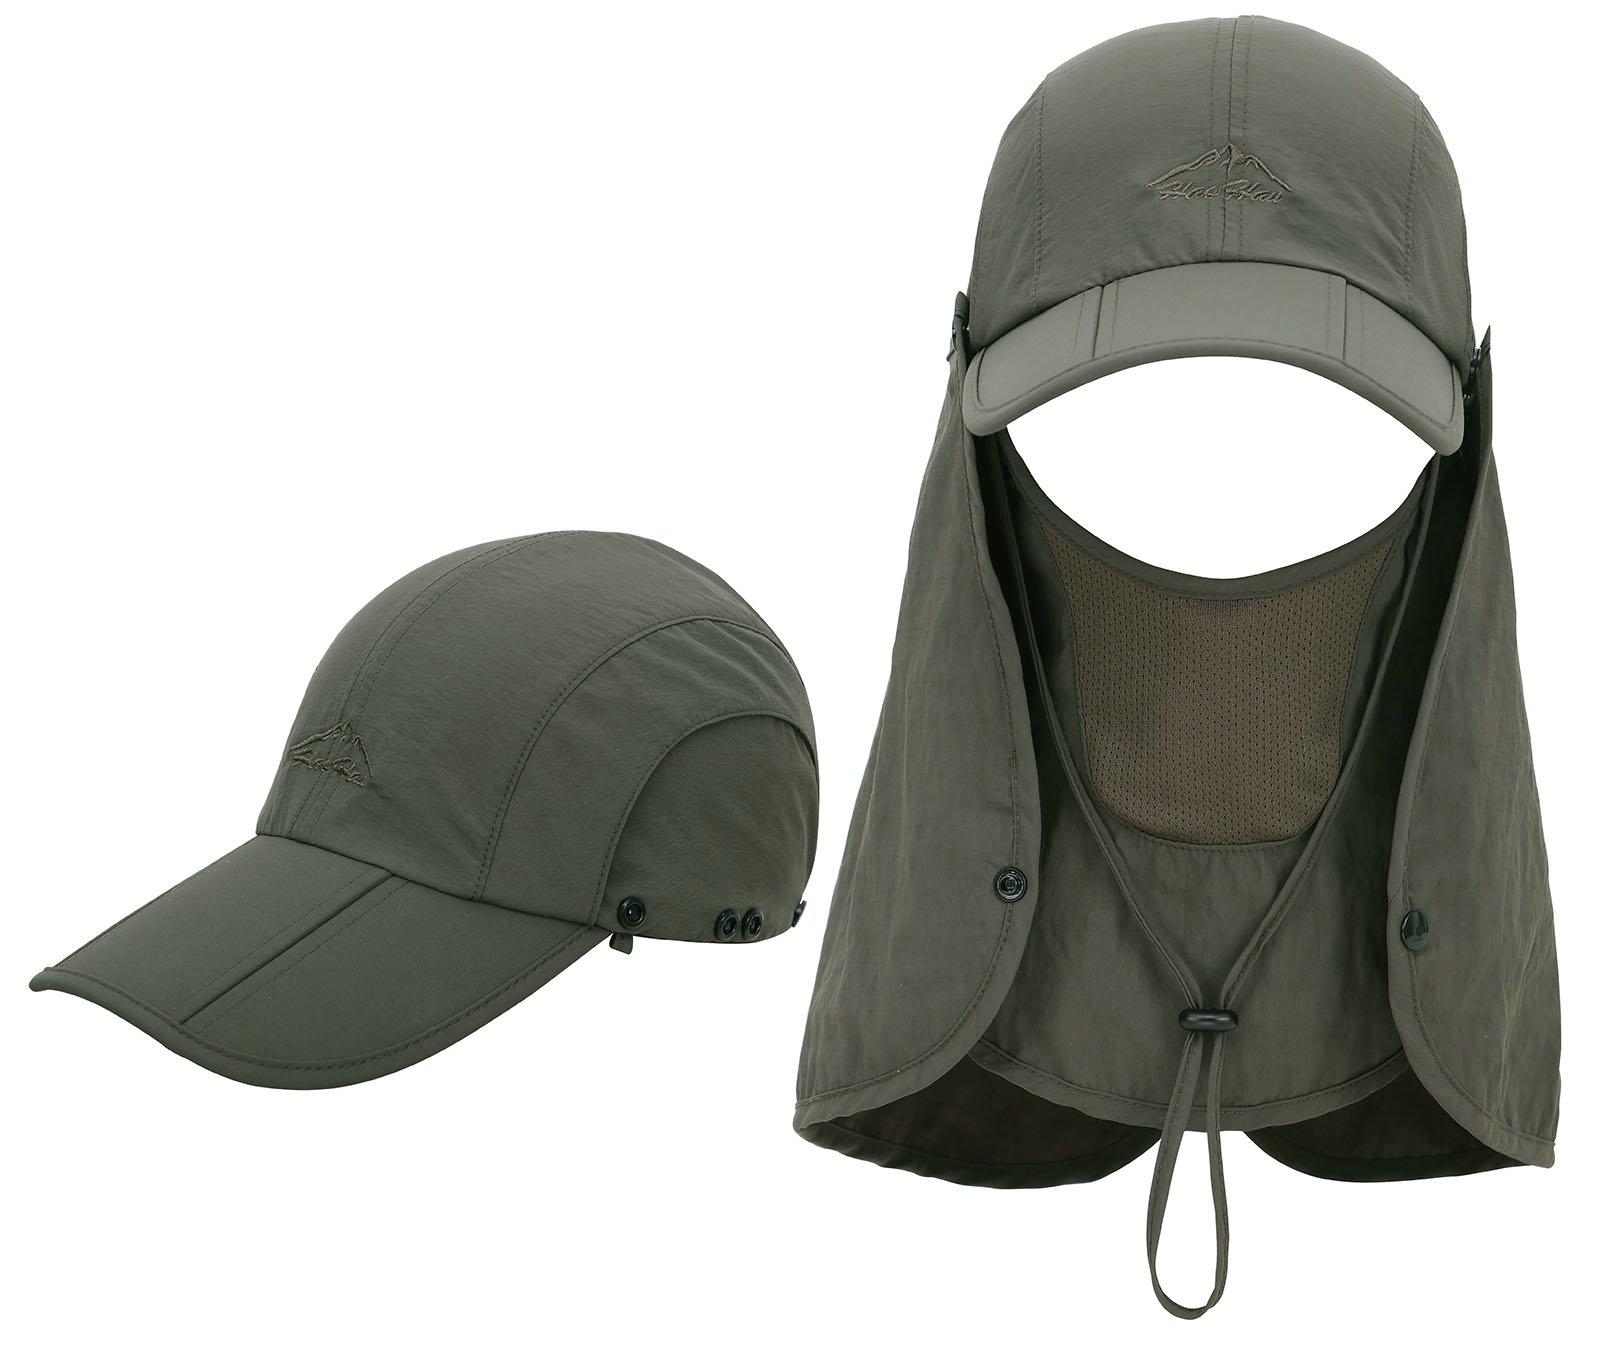 EPYA Sun Hat Outdoors Quick Dry UV Protection Safari Hat w/Flap Neck,Army Green by EPYA (Image #2)